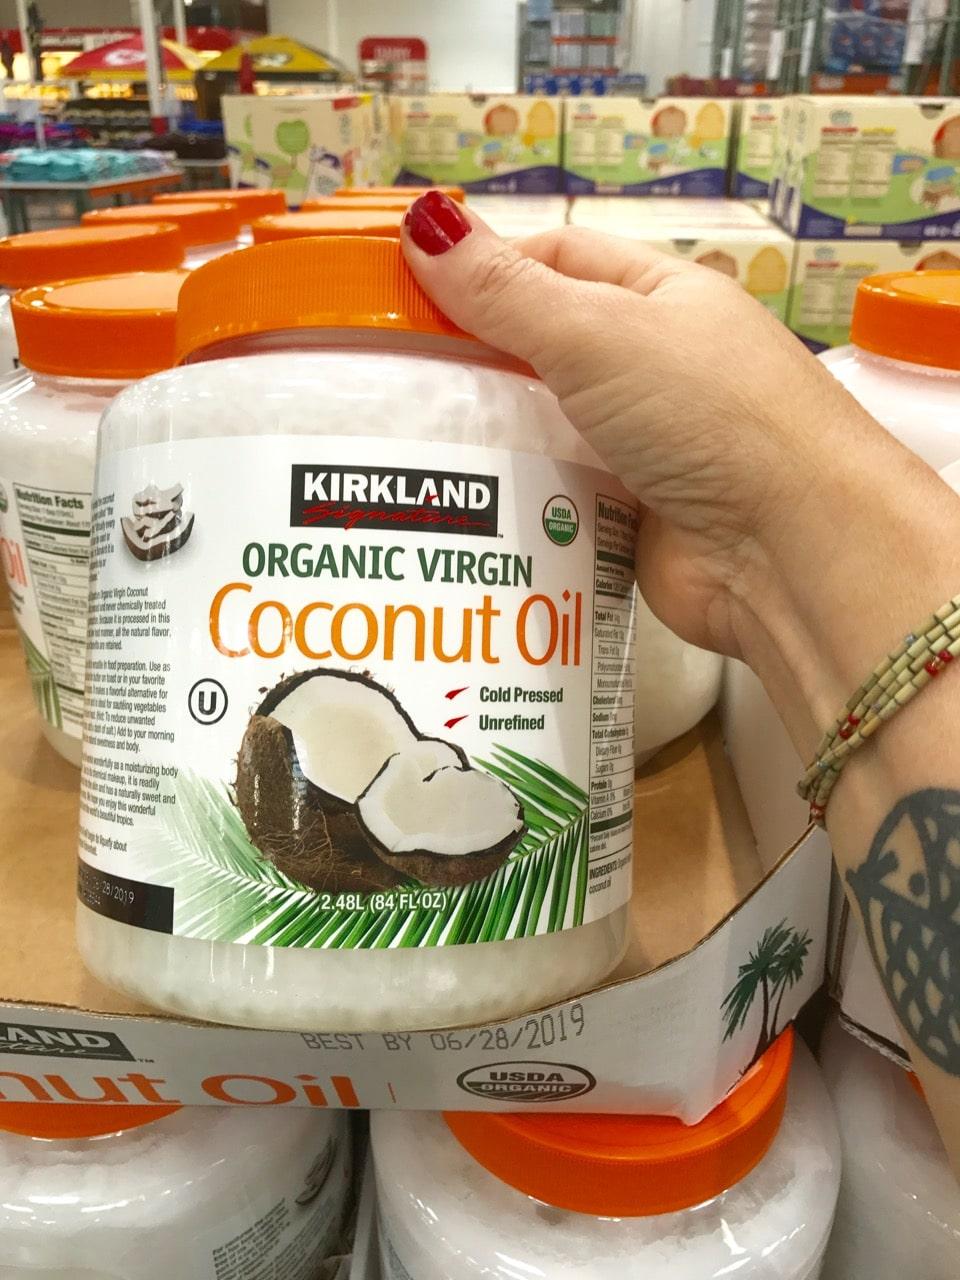 36 Favorite Vegan Products at Costco: Kirkland Coconut Oil